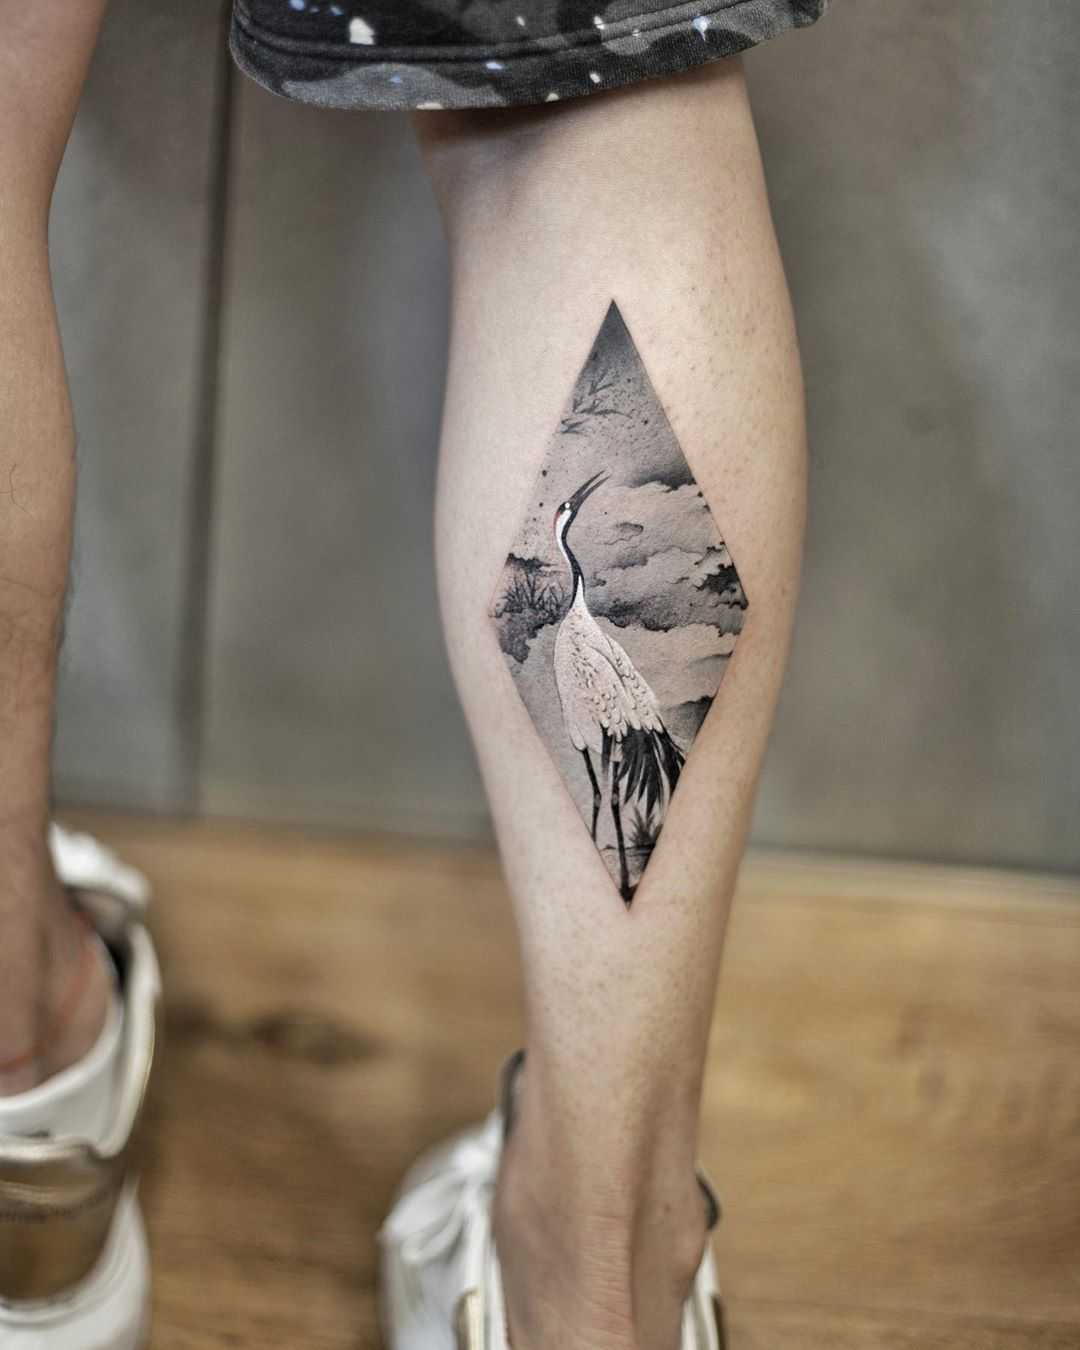 Watercolor crane by tattooist Chenjie